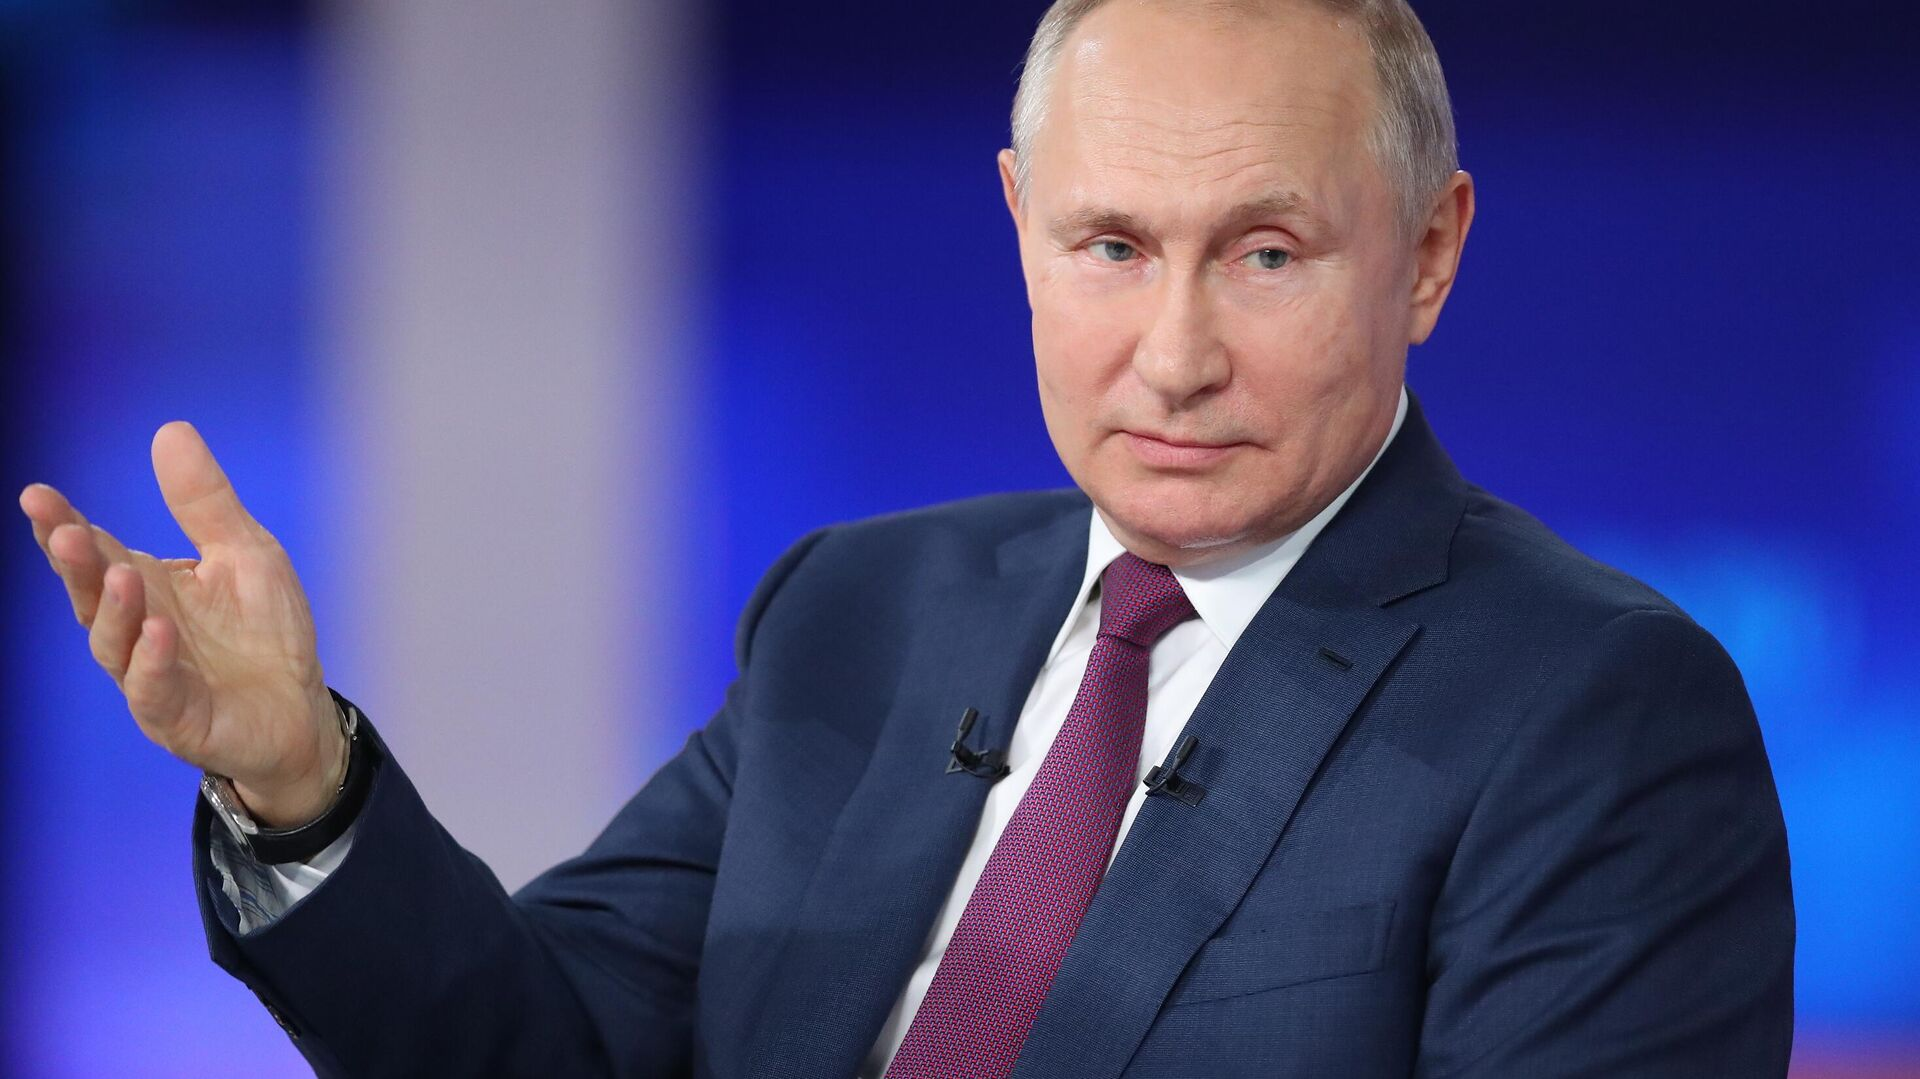 Vladímir Putin, presidente de Rusia - Sputnik Mundo, 1920, 13.07.2021